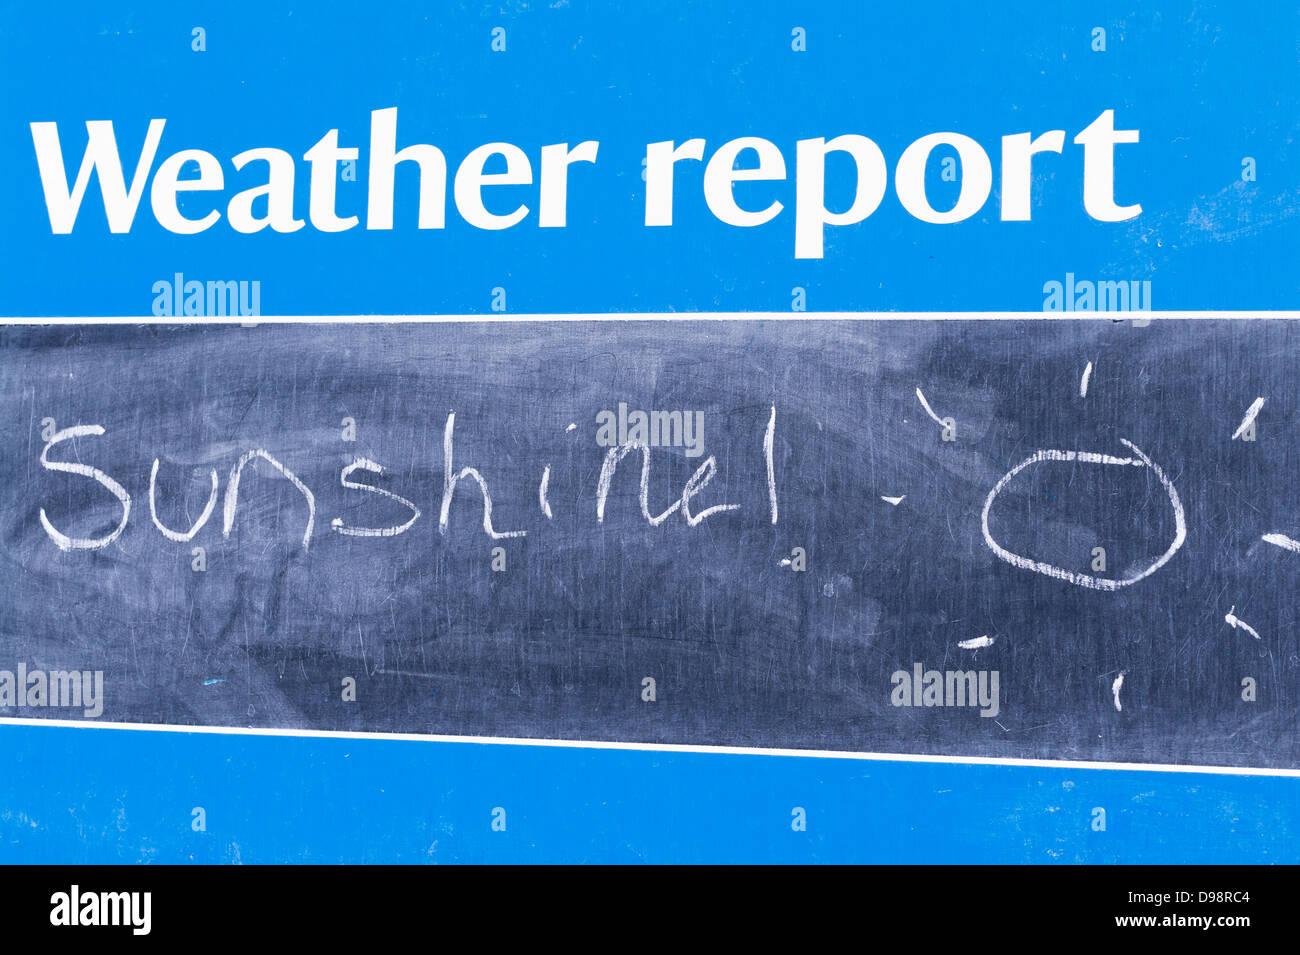 Chalkboard weather report sign predicting sunshine - Stock Image